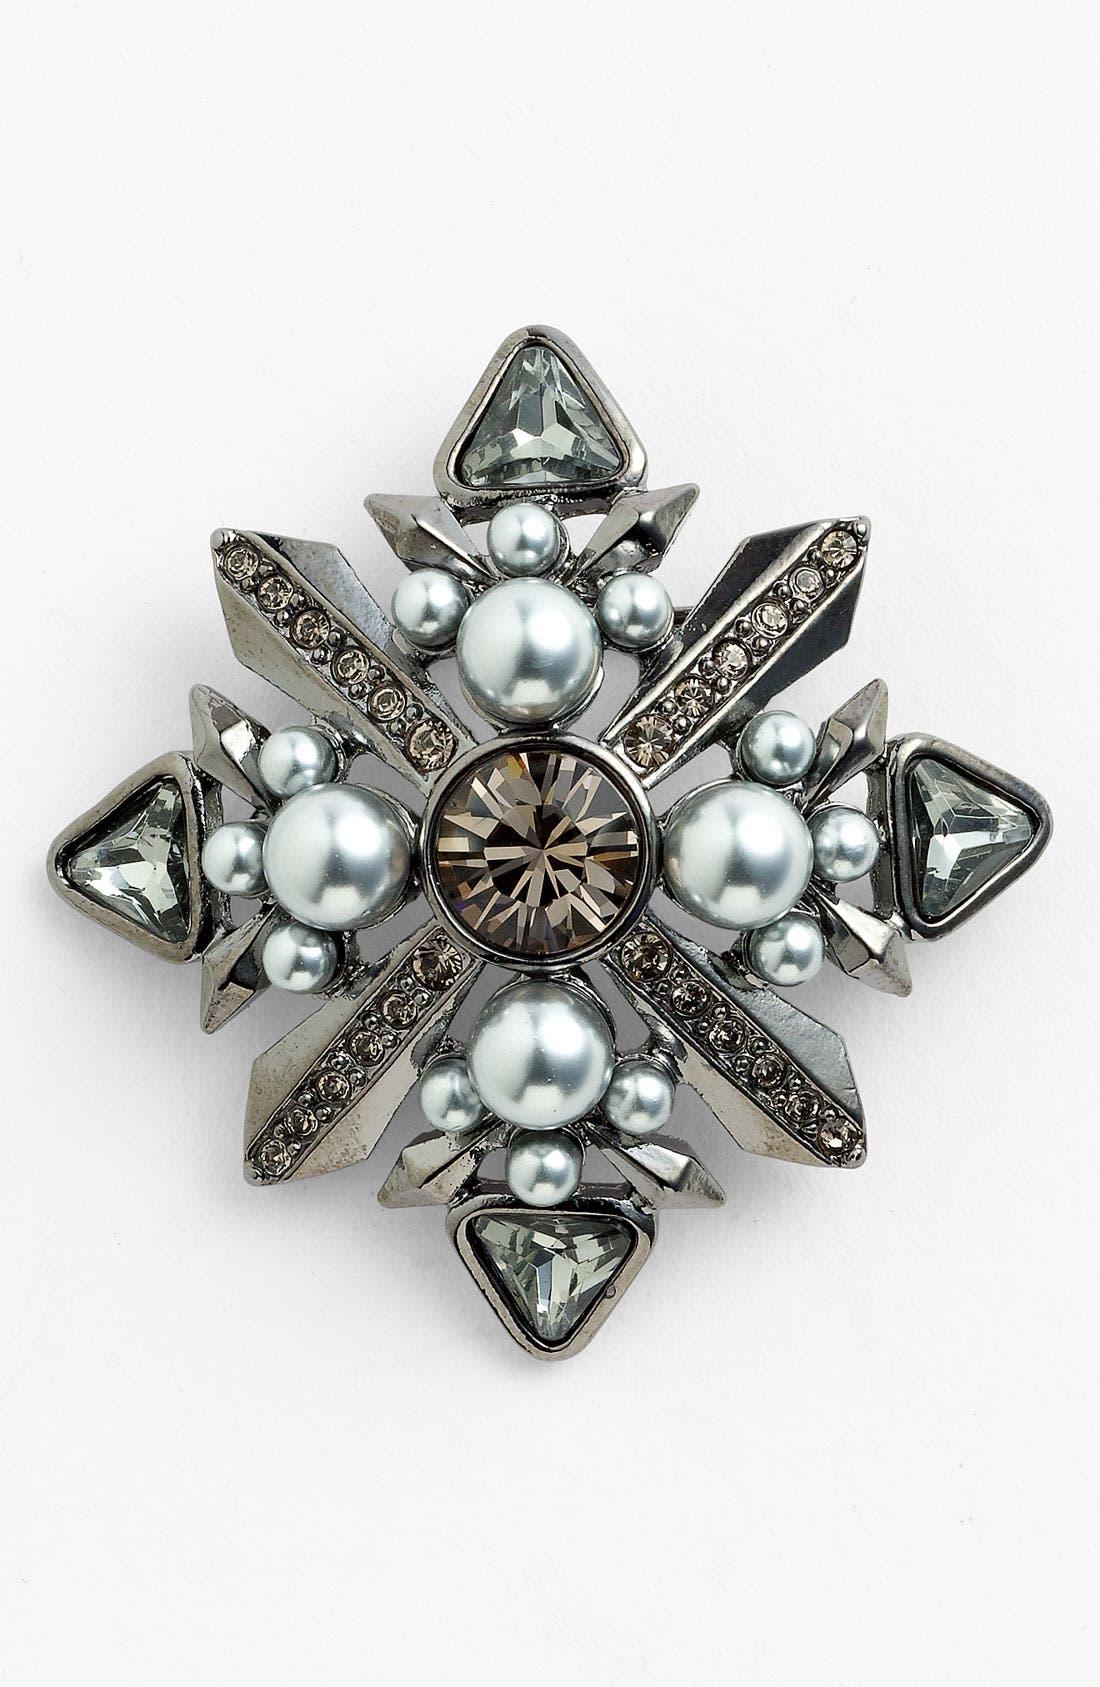 Main Image - Givenchy Glass Pearl & Crystal Brooch